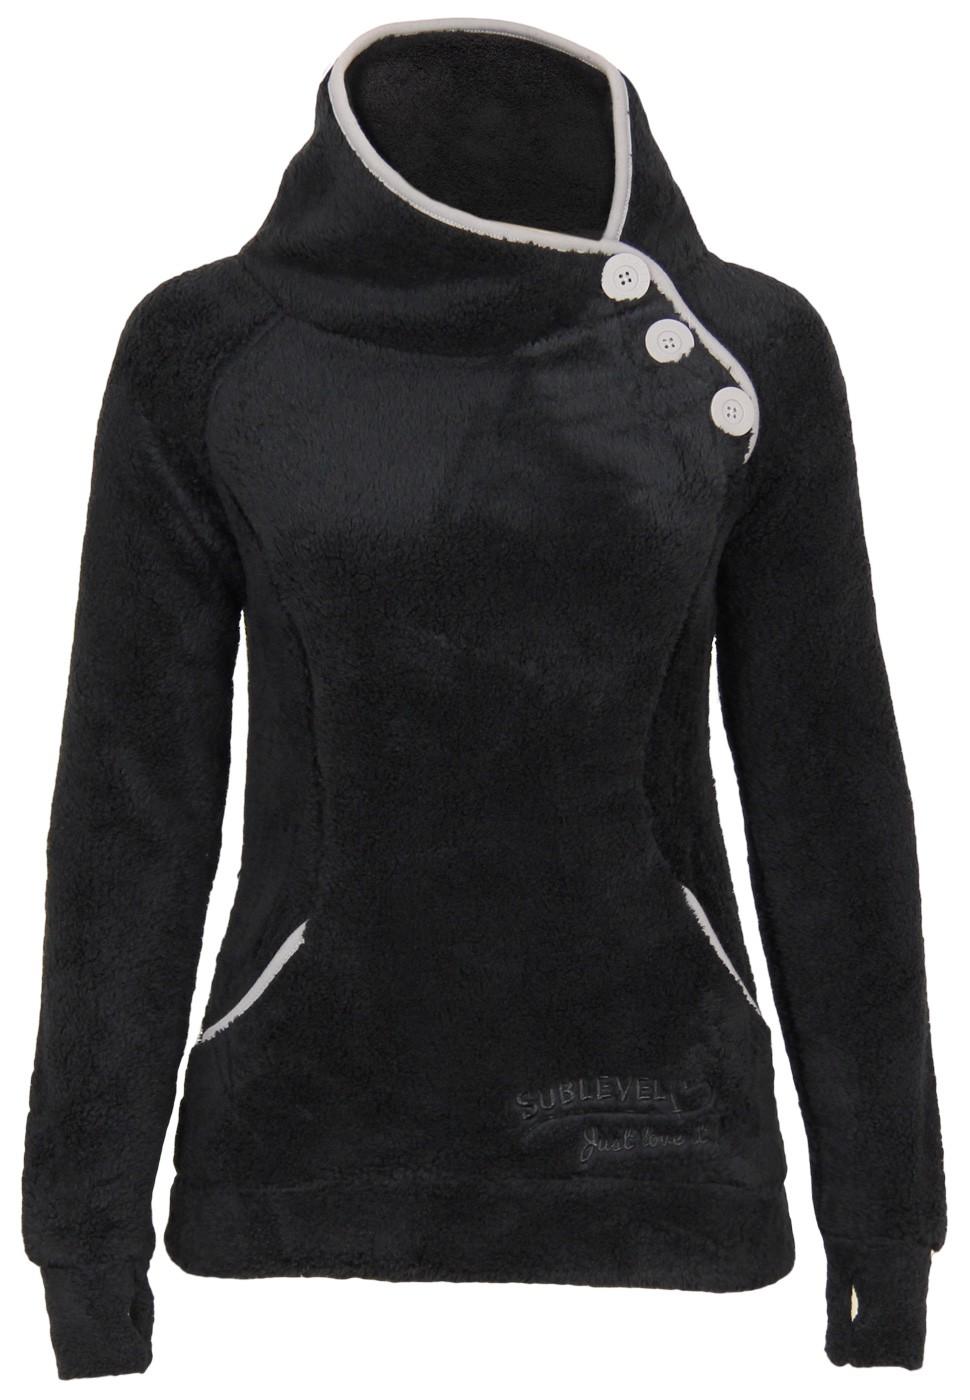 sublevel teddy fleece jacke mit daumenloch damen sweatshirts. Black Bedroom Furniture Sets. Home Design Ideas